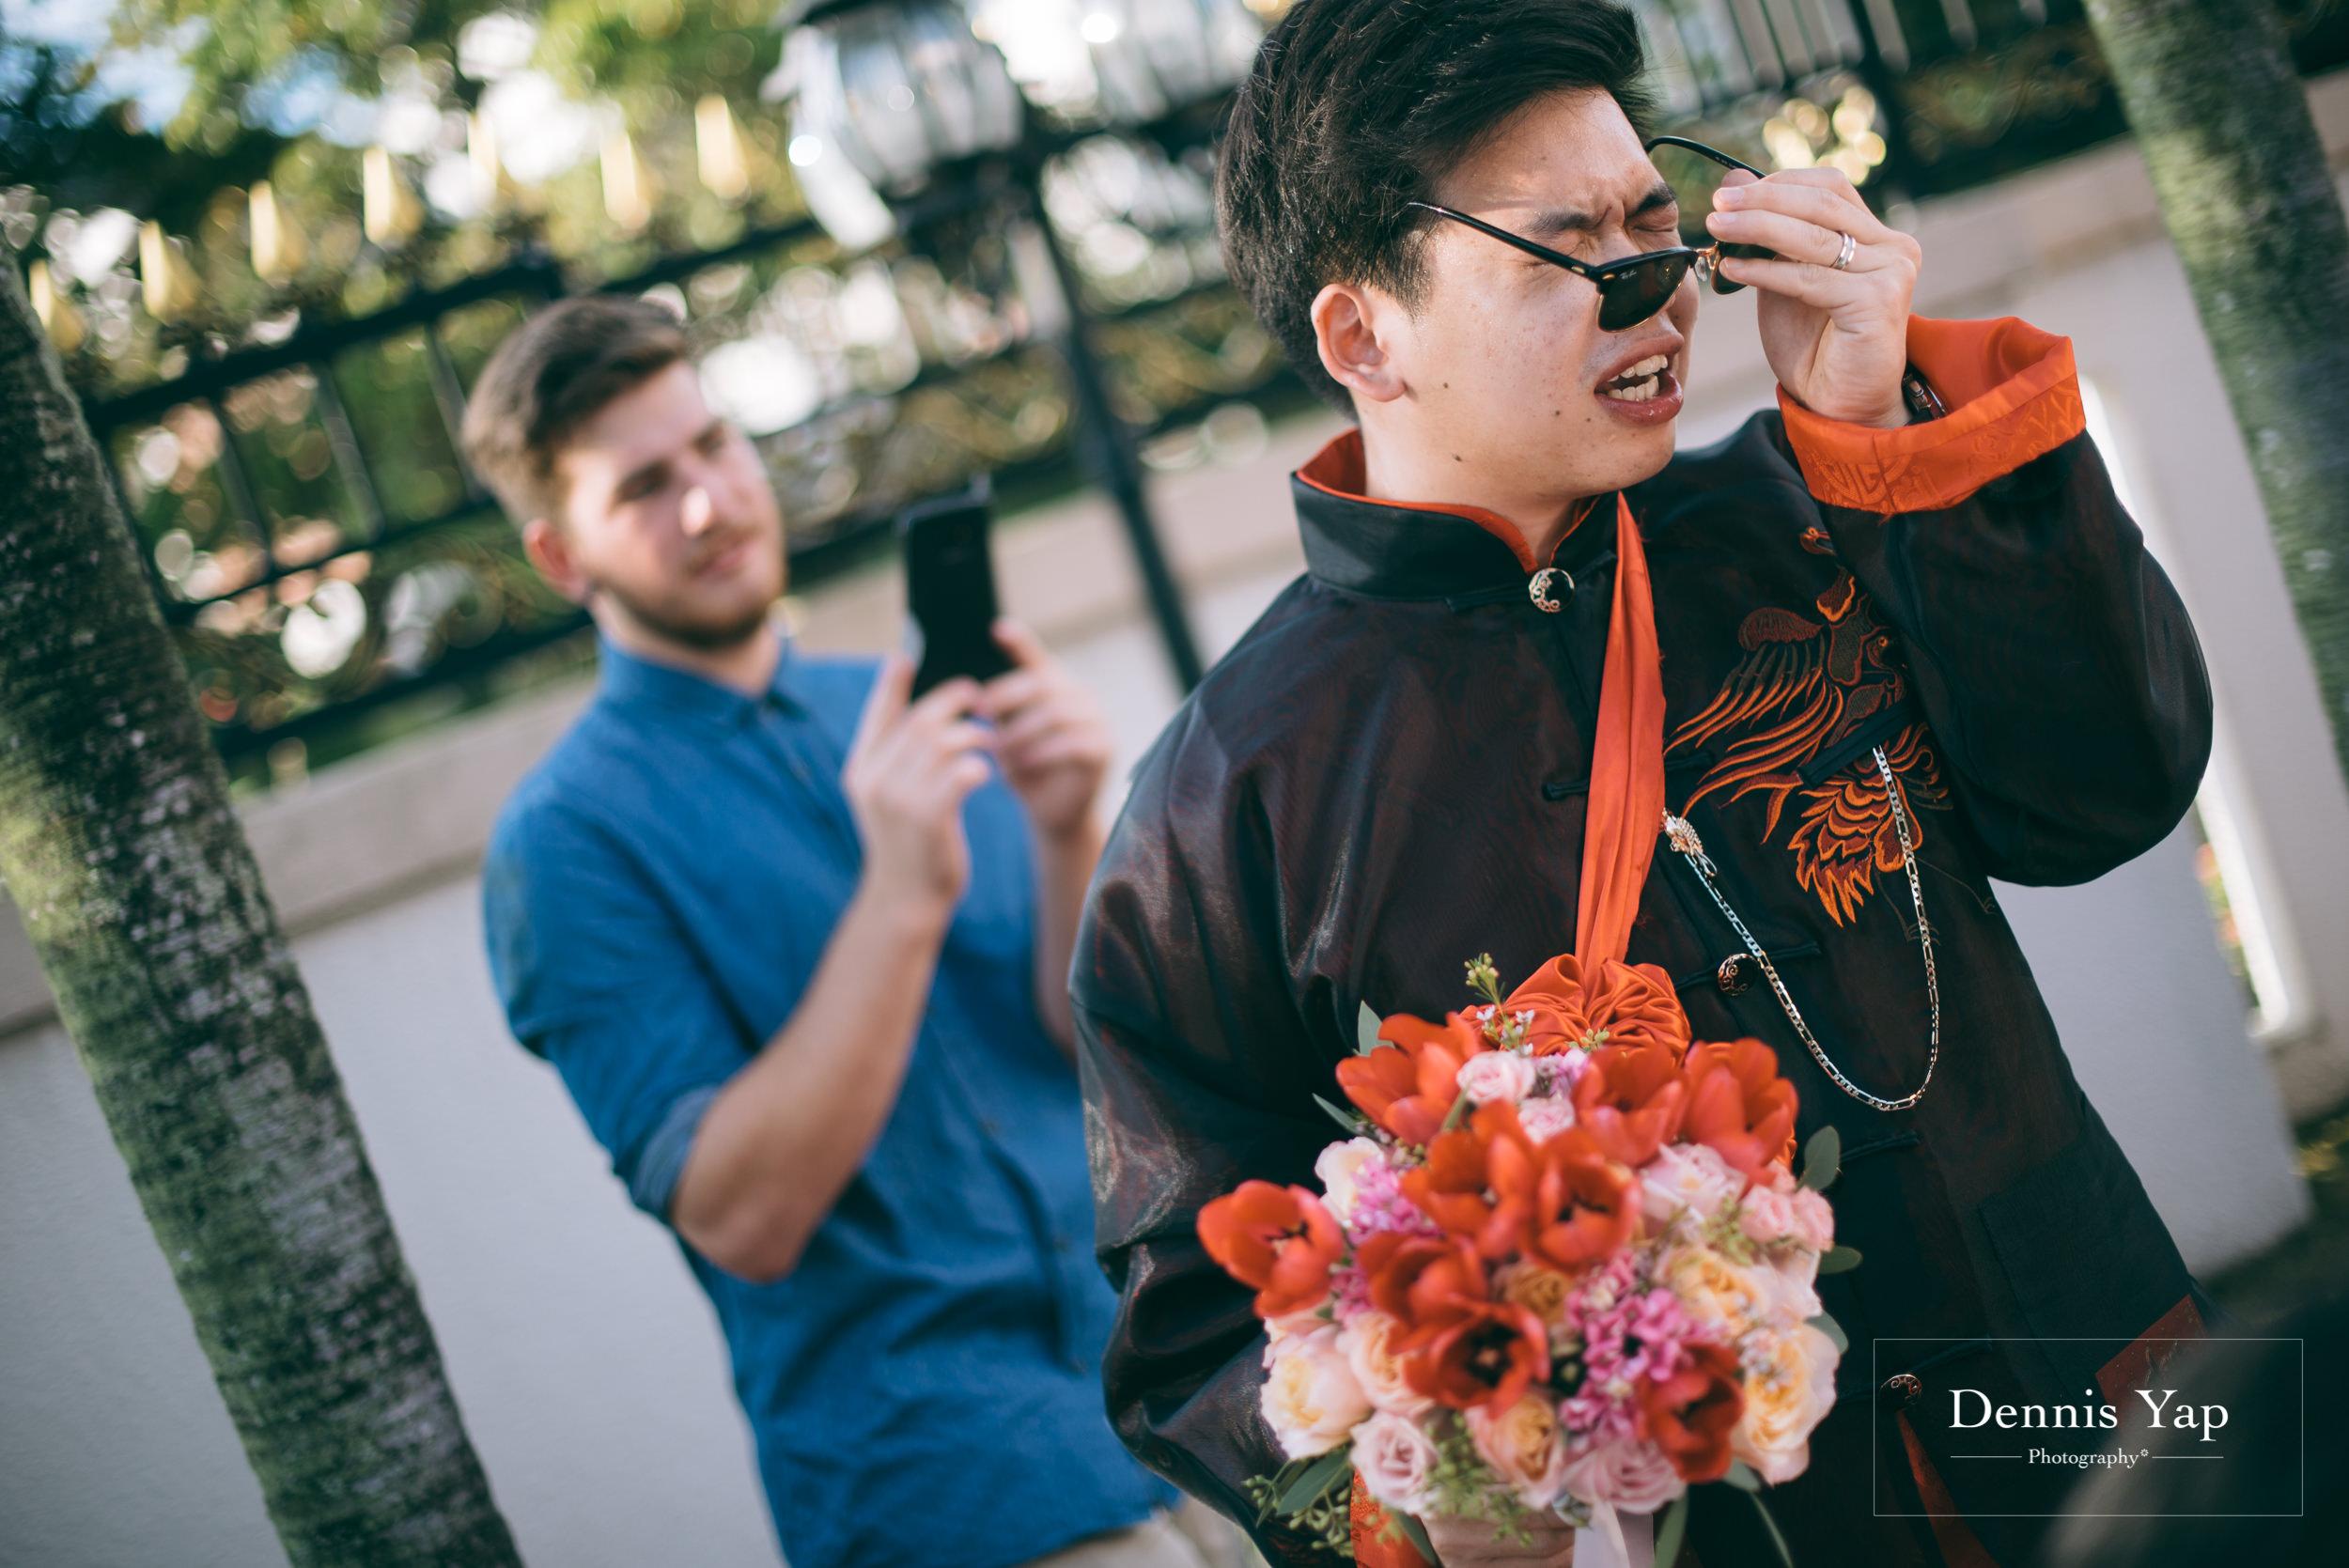 kuan rachel wedding day kuala lumpur melbourne gate crash dennis yap malaysia wedding photographer-10.jpg